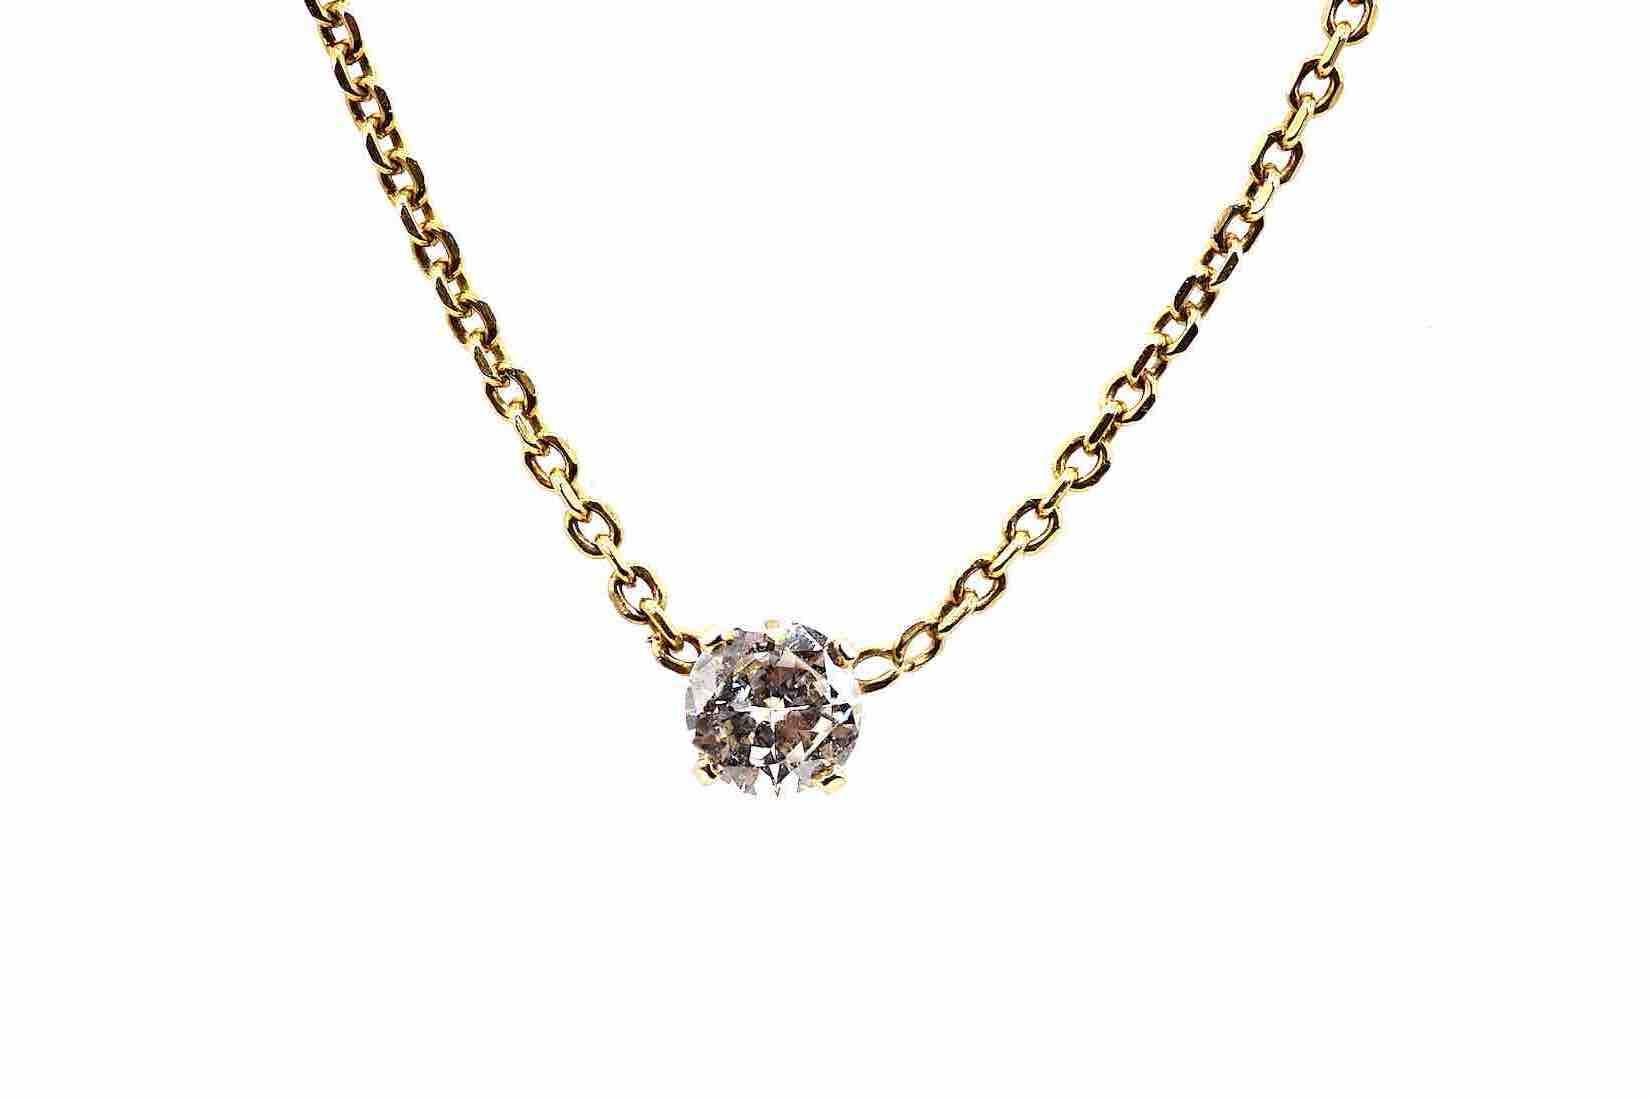 Collier pendentif diamant en or jaune 18k